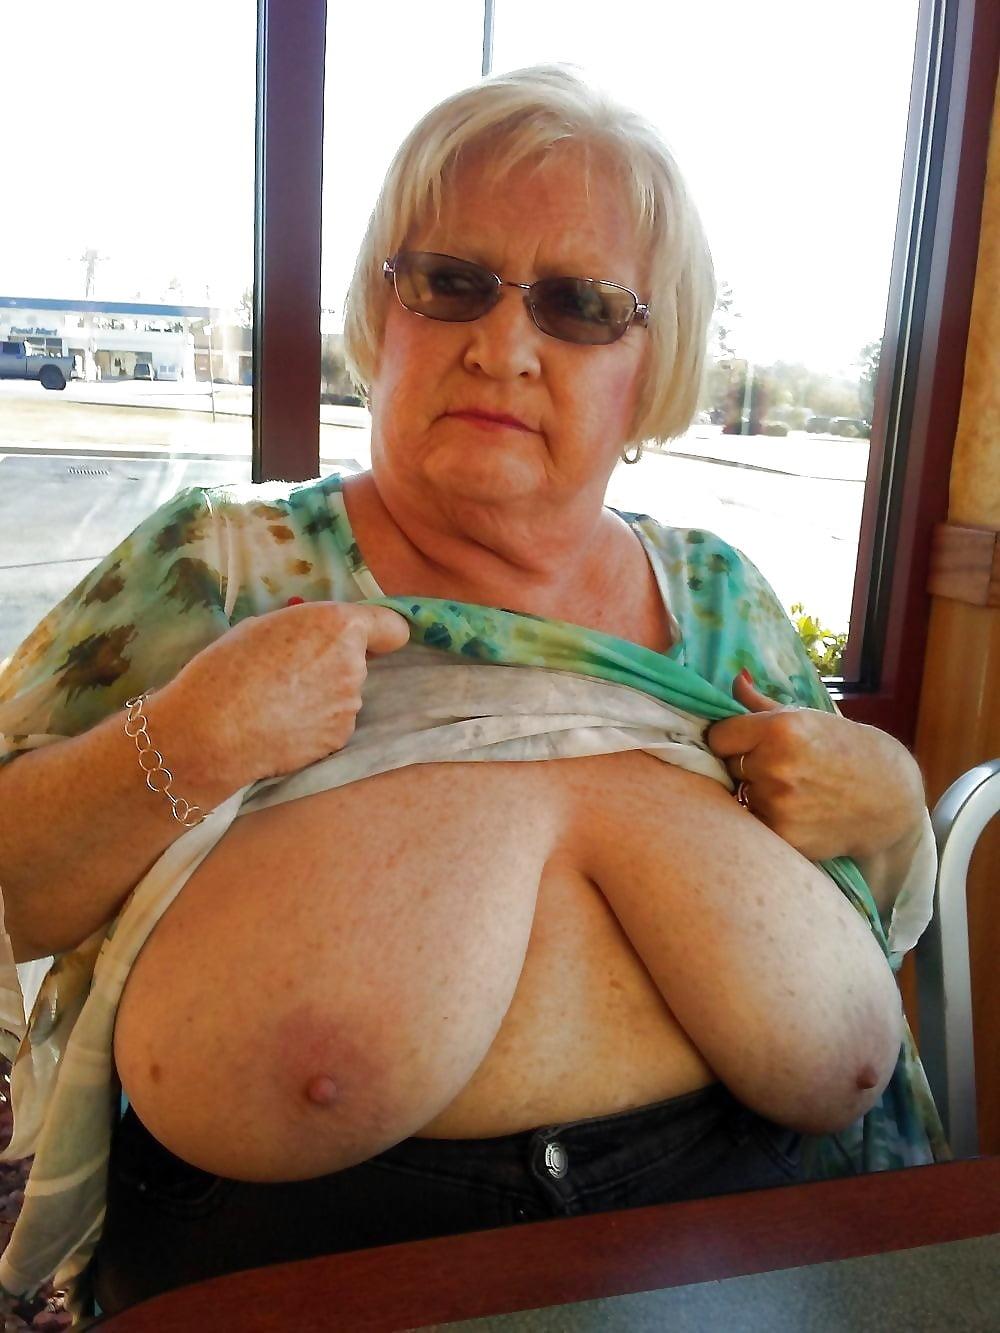 Black Granny Nude Pics, Granny Porn Photos